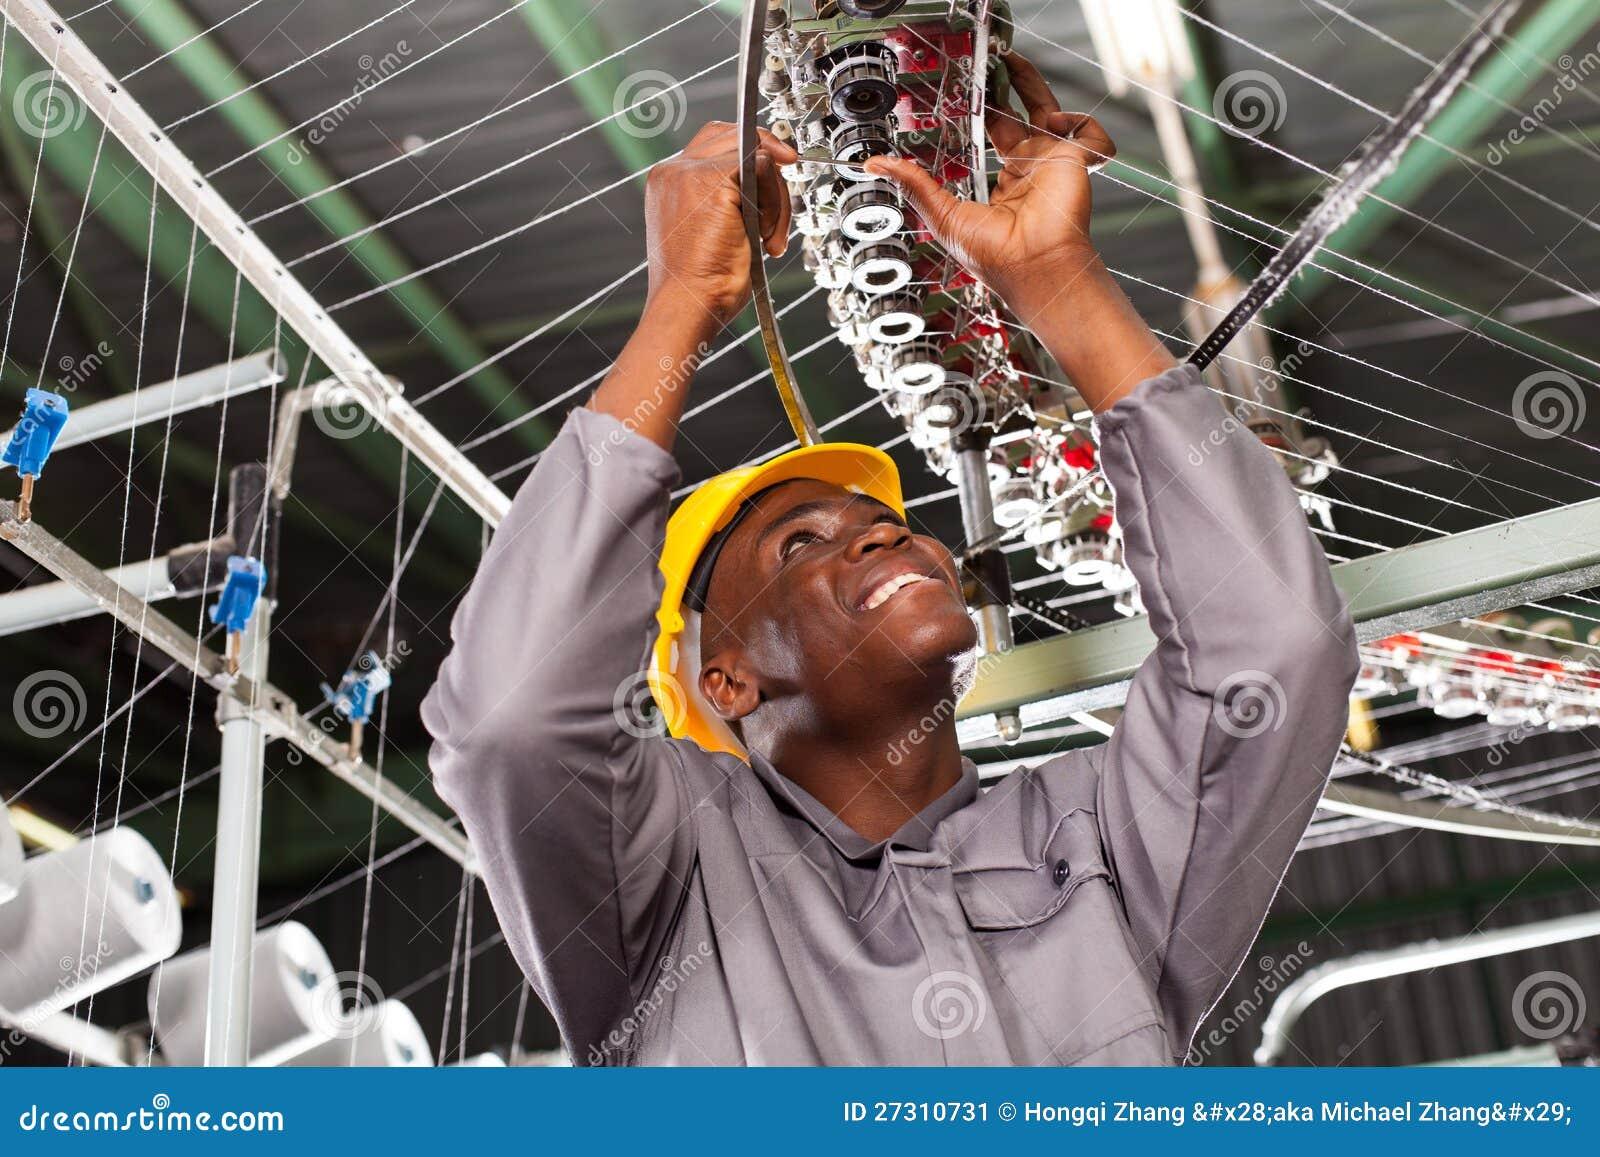 Textile Industrial Mechanic Stock Image - Image: 27310731